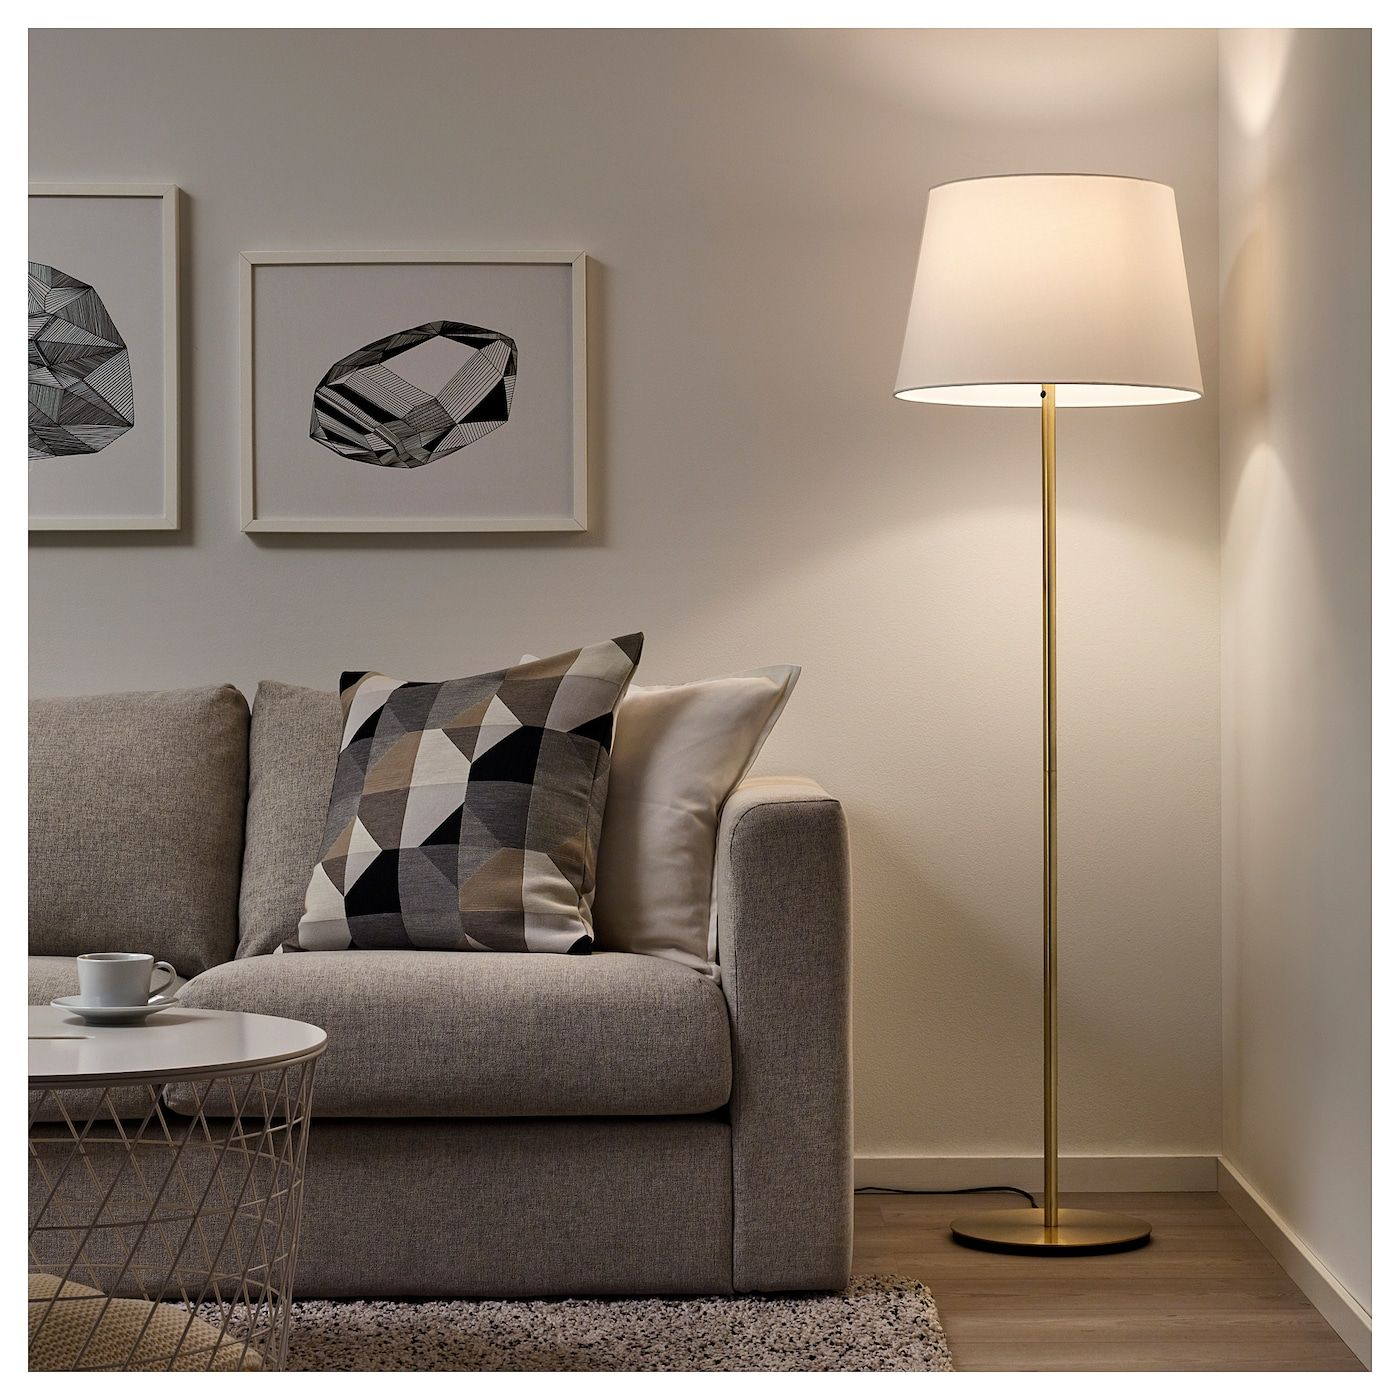 Skaftet Floor Lamp Base Brass Color Ikea Floor Lamp Base Floor Lamp Floor Lamps Living Room